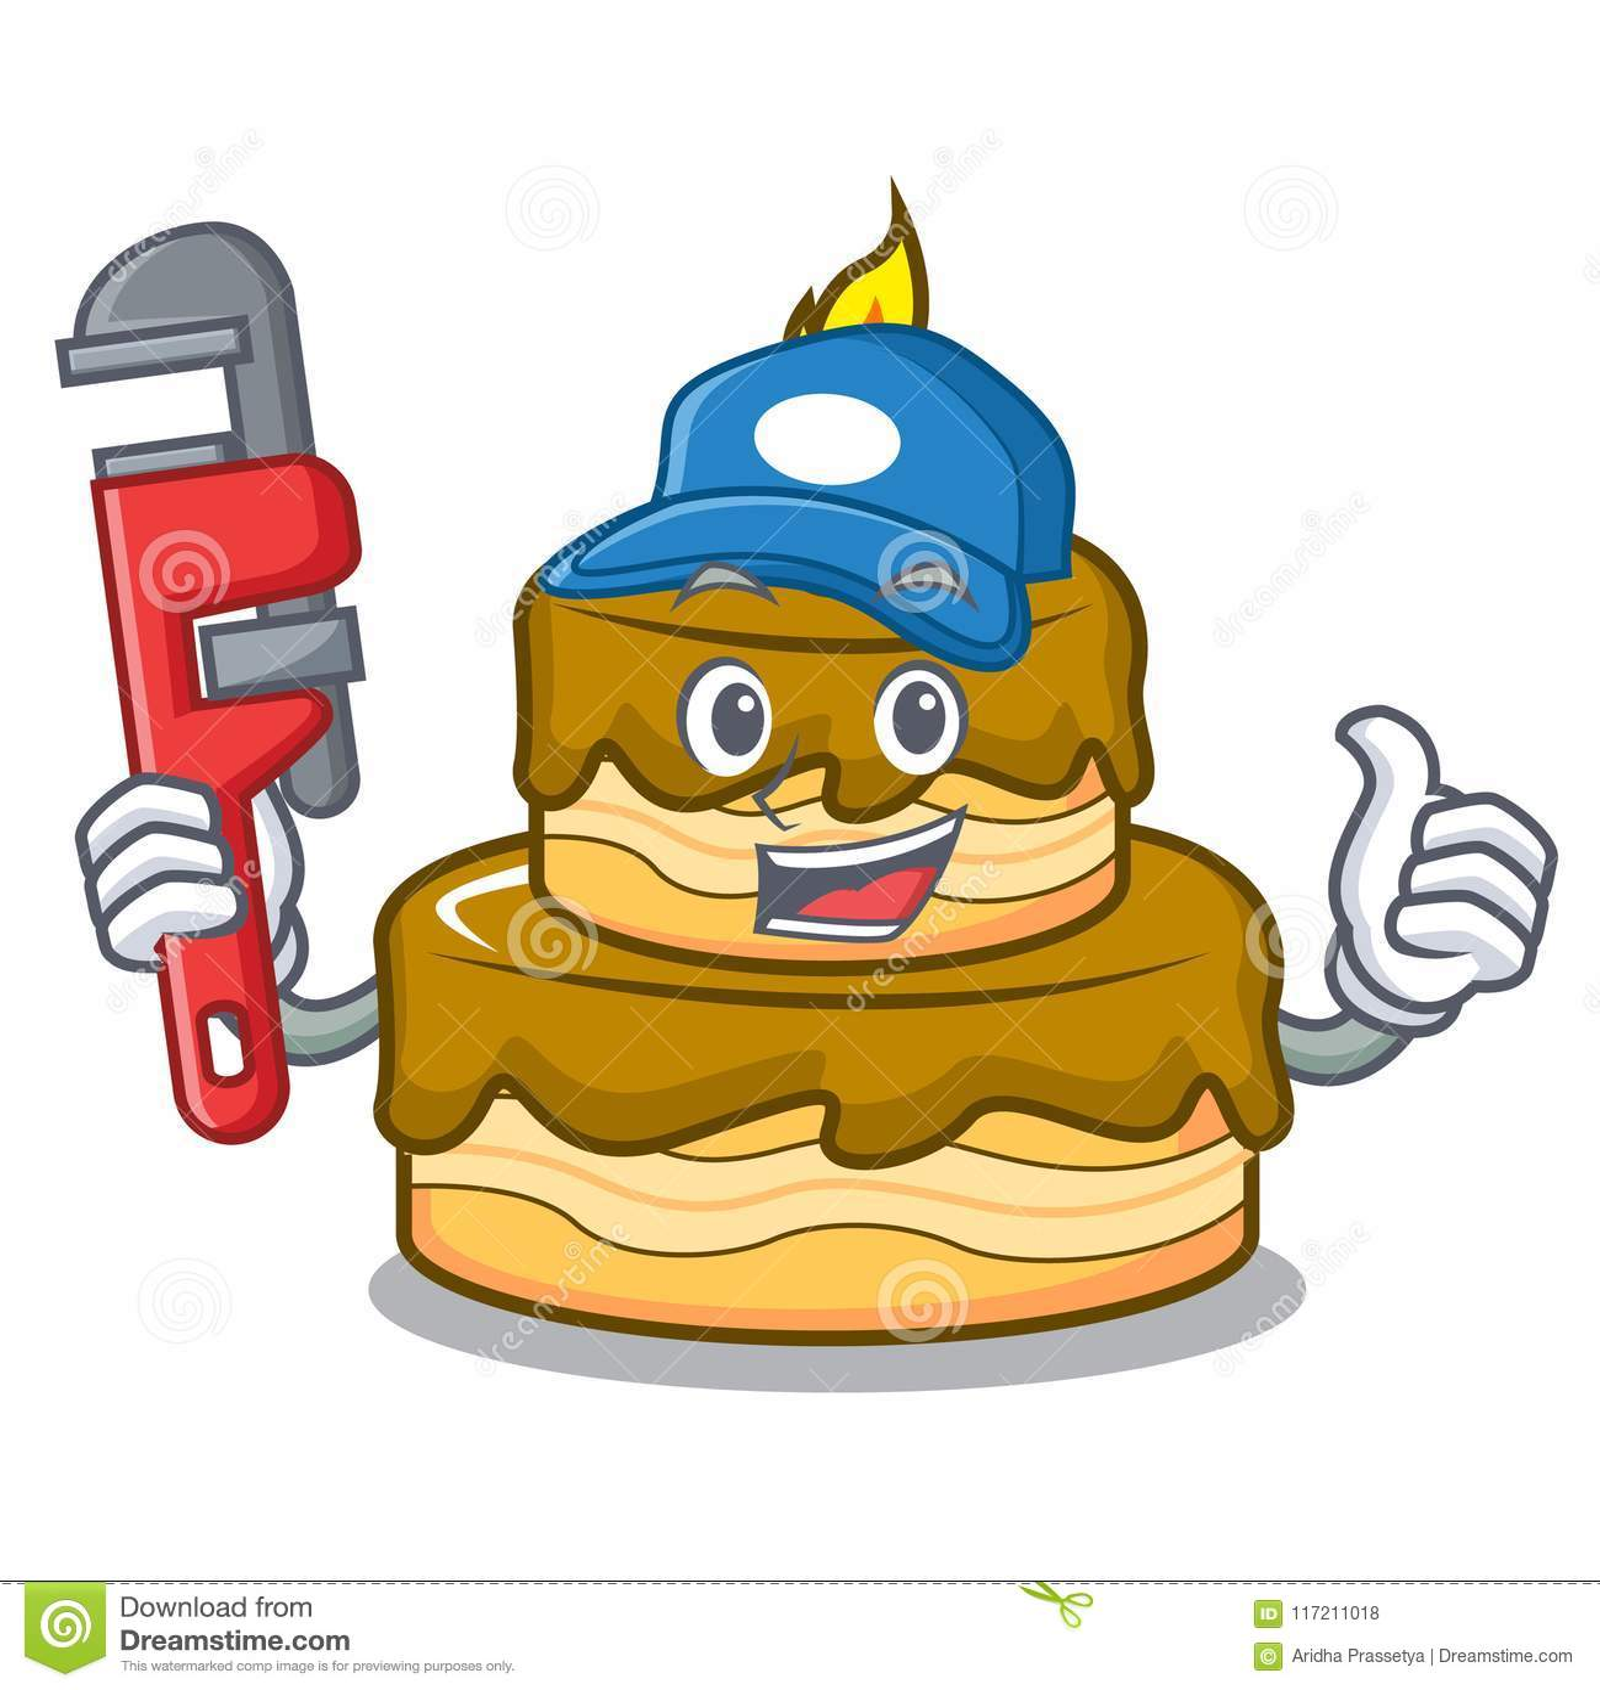 Pleasing Plumber Birthday Cake Mascot Cartoon Stock Vector Illustration Funny Birthday Cards Online Unhofree Goldxyz